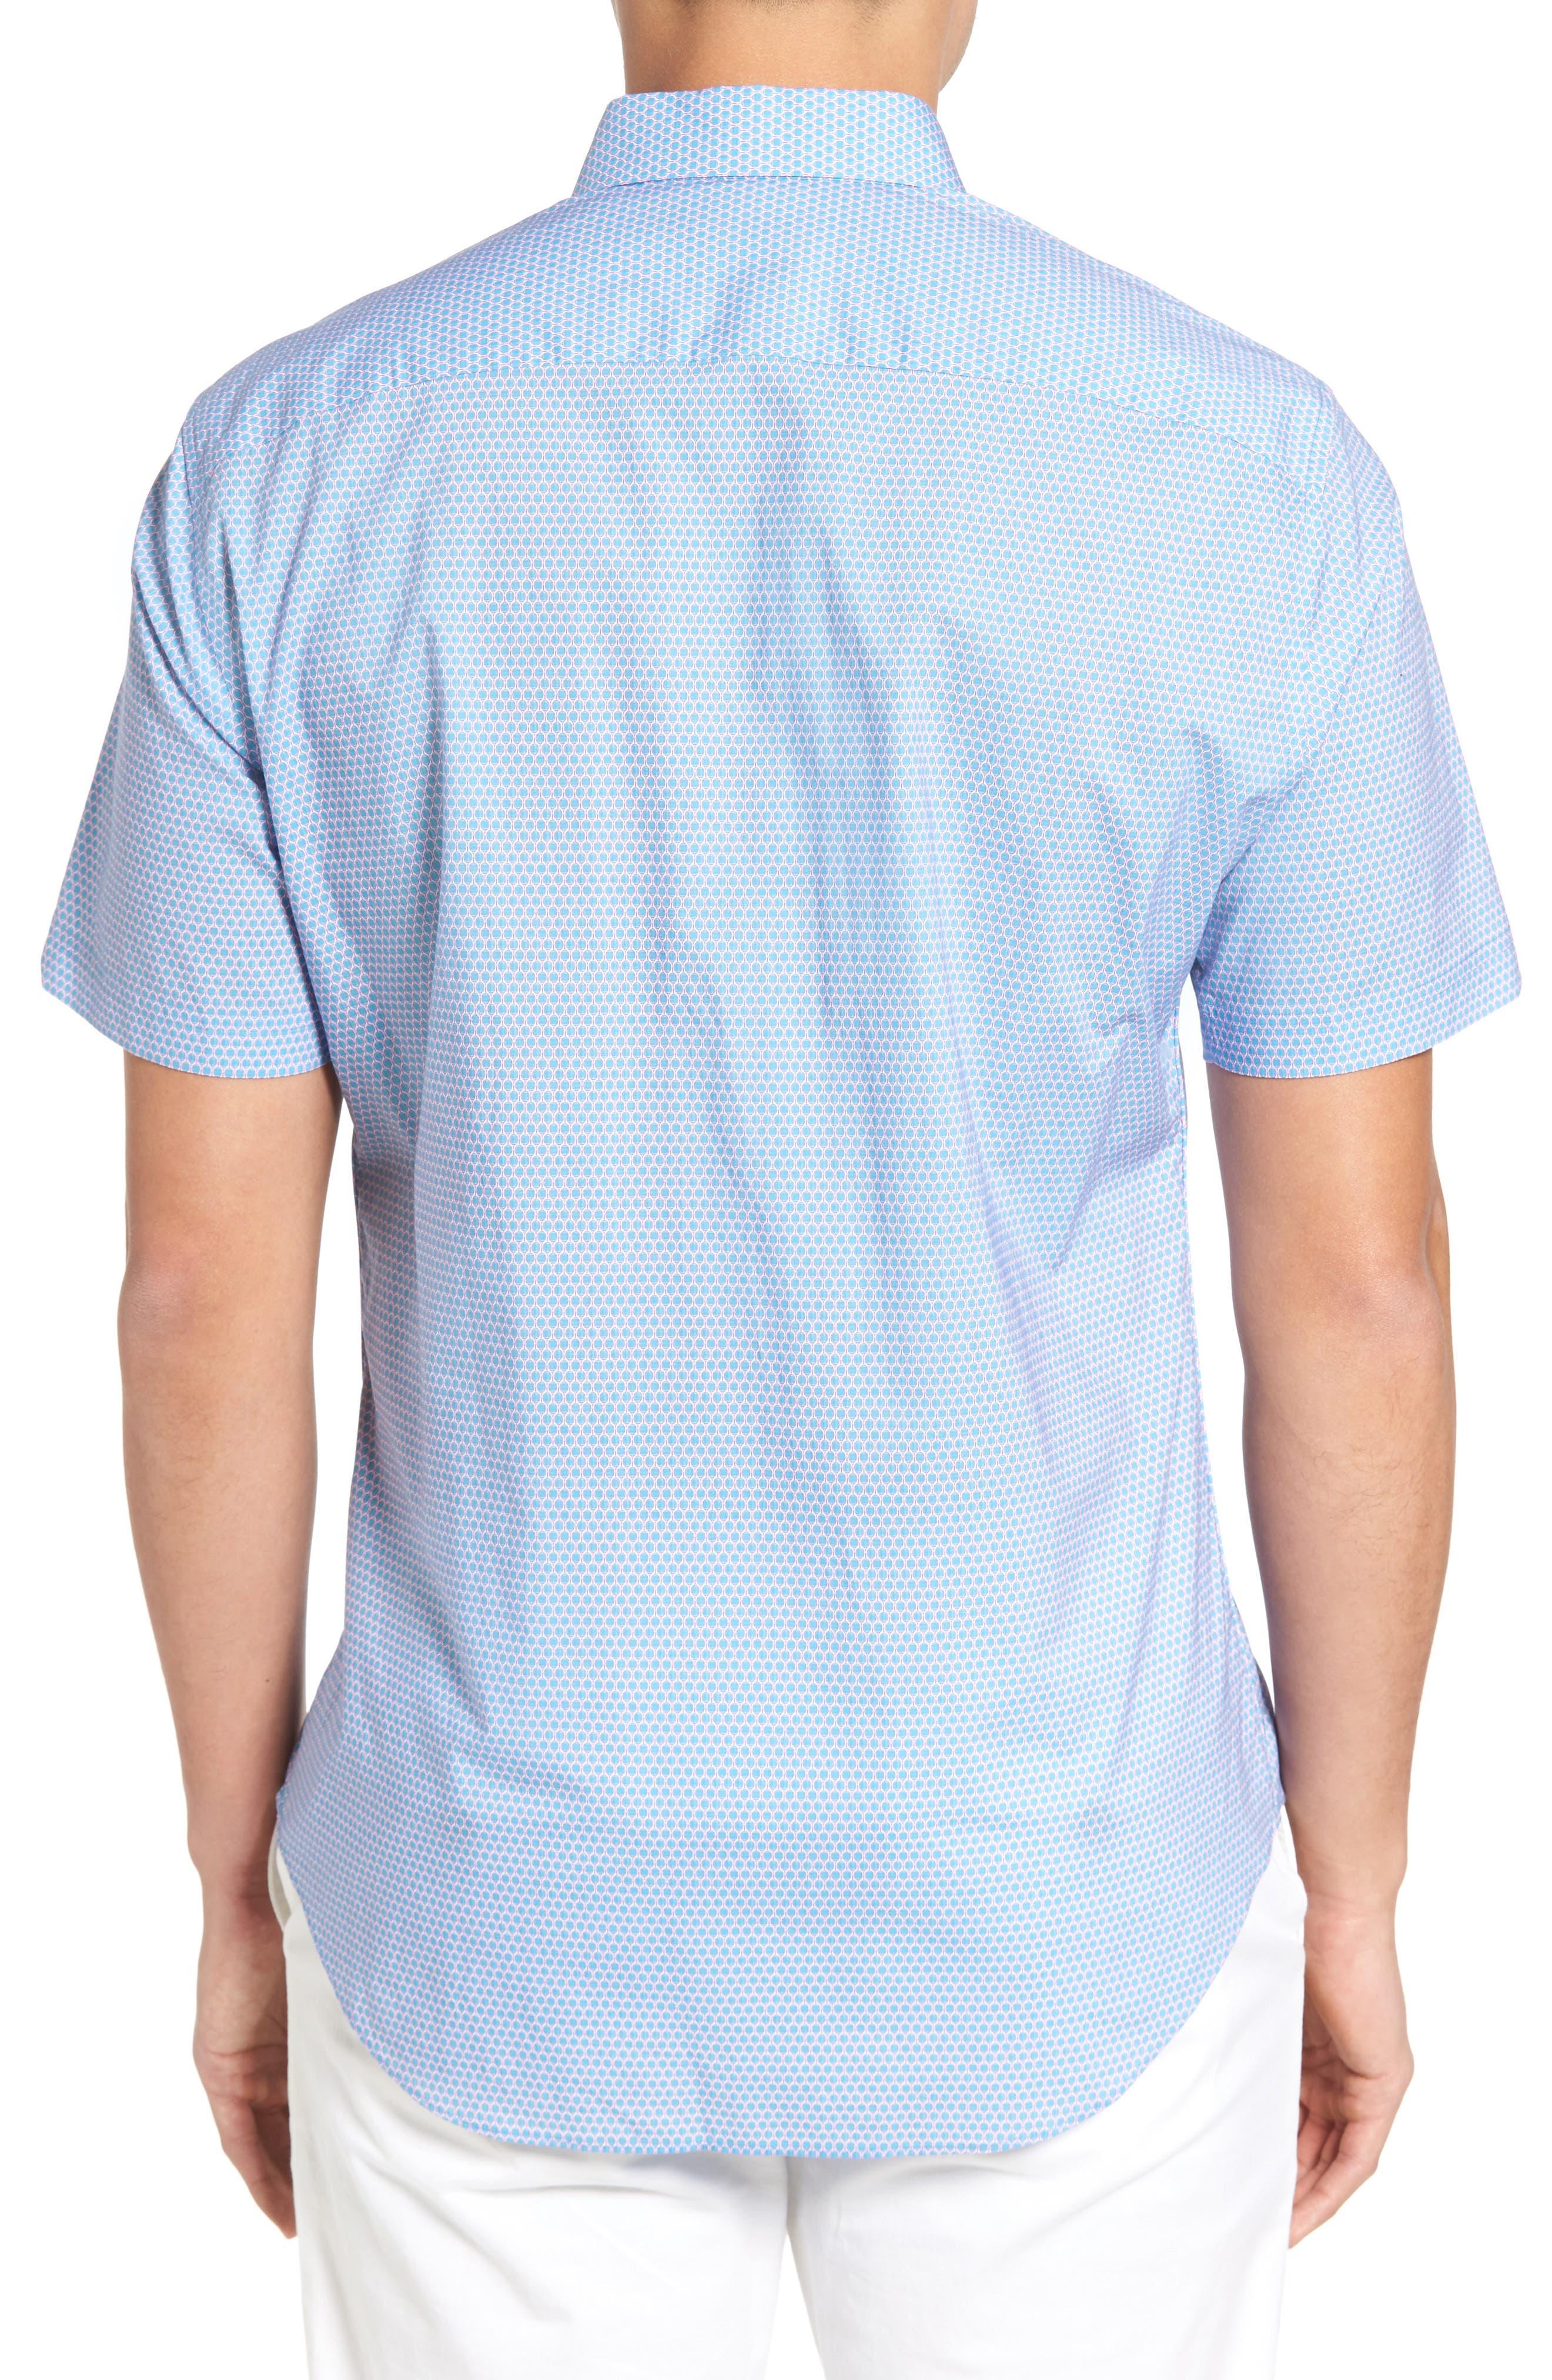 Alternate Image 2  - Zachary Prell Parker Trim Fit Print Sport Shirt